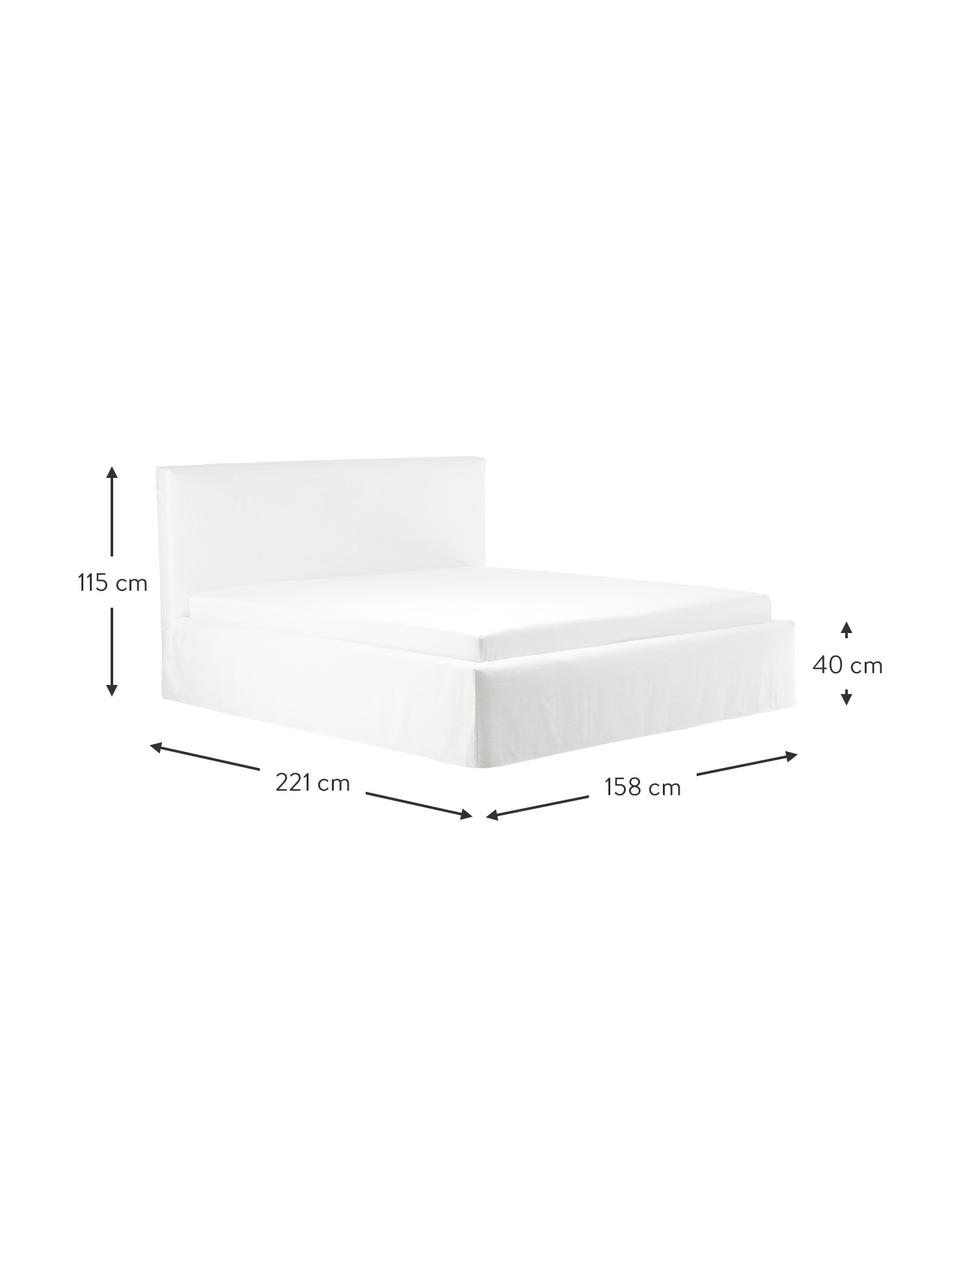 Gestoffeerd bed Feather met opbergruimte in crèmewit, Frame: massief grenenhout en pla, Bekleding: polyester (gestructureerd, Geweven stof crèmewit, 180 x 200 cm